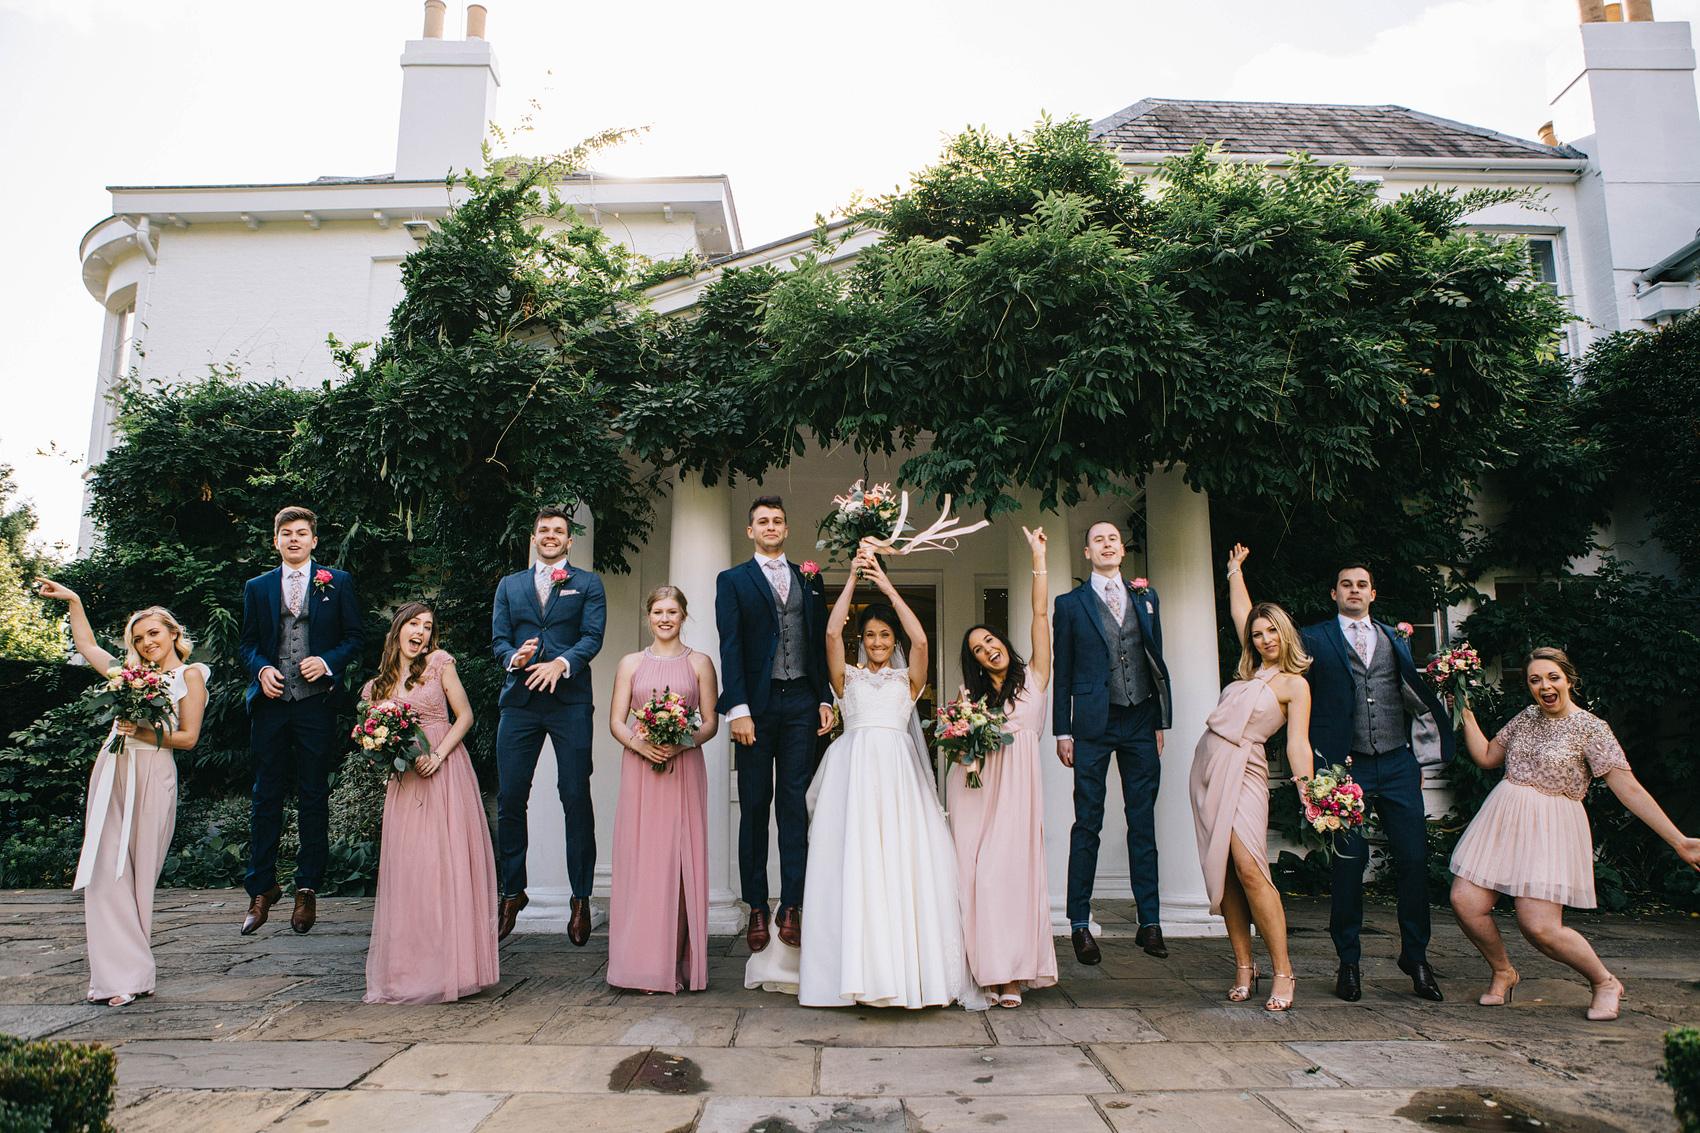 Claire_Basiuk_Richmond_Park,_London_Wedding_Photography_-8.jpg